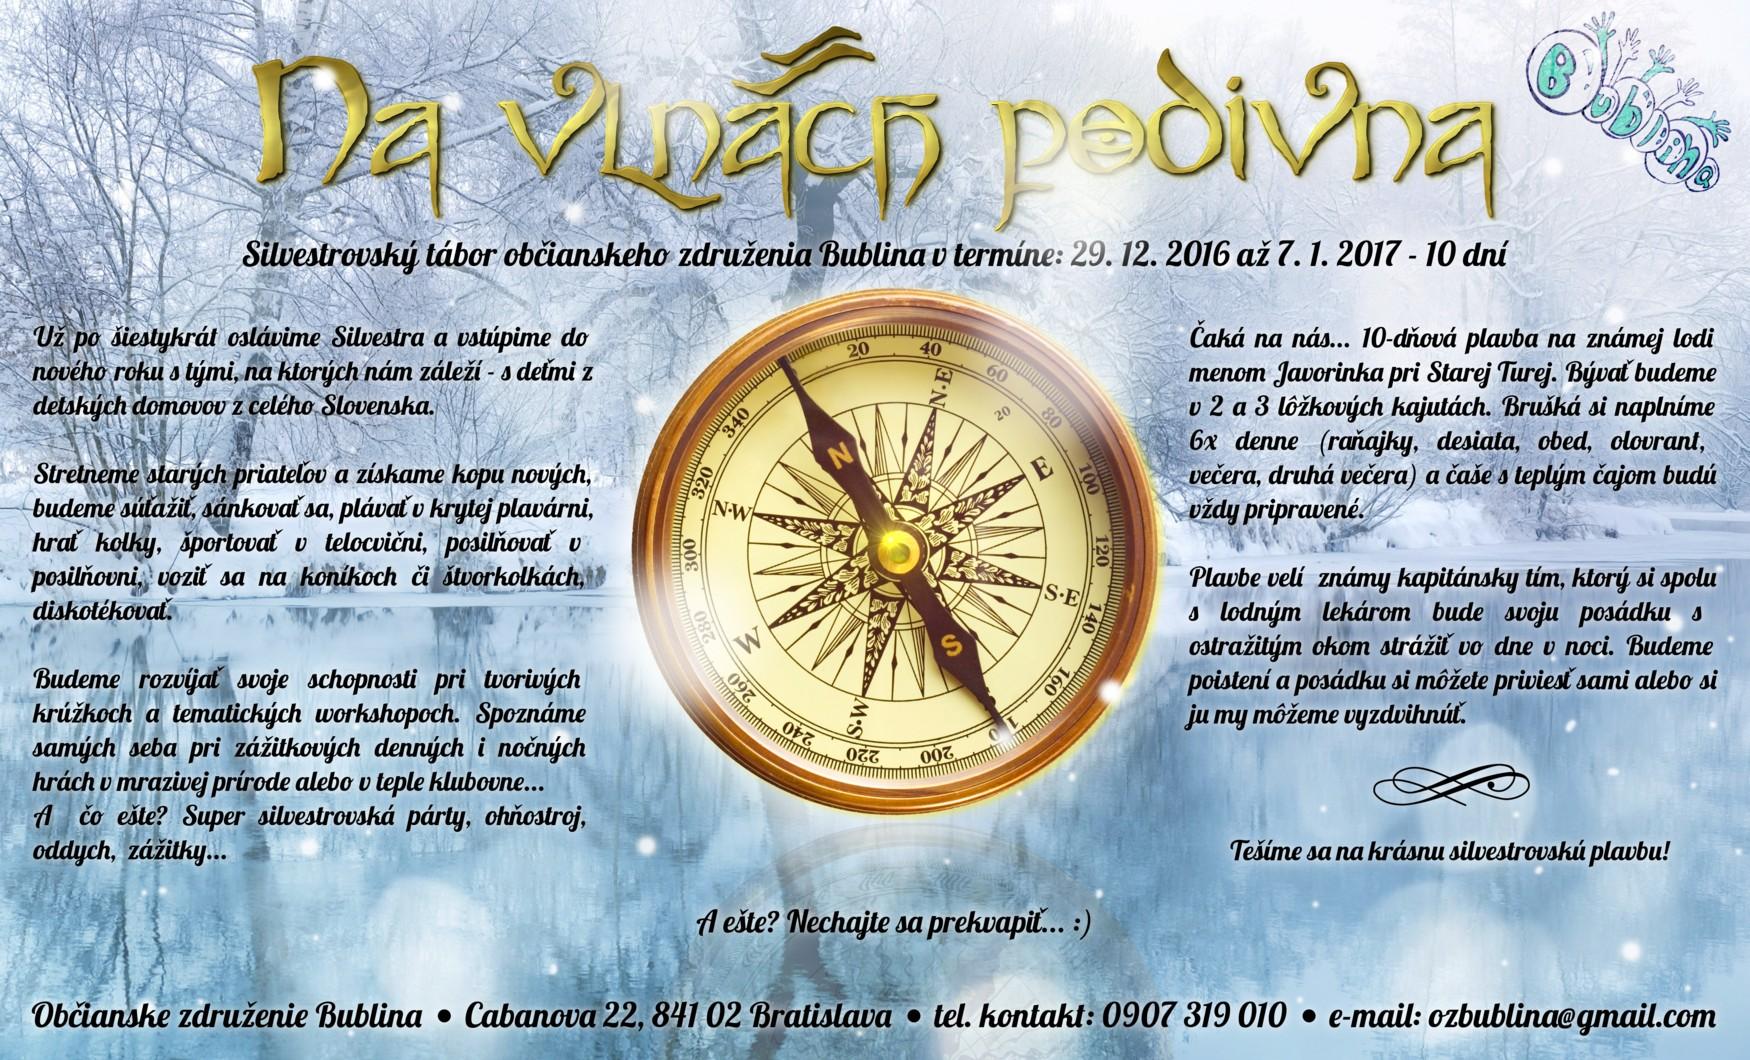 ponuka-silvestrovsky-tabor-na-vlnach-podivna-2016-2017 fbed33dcd8f